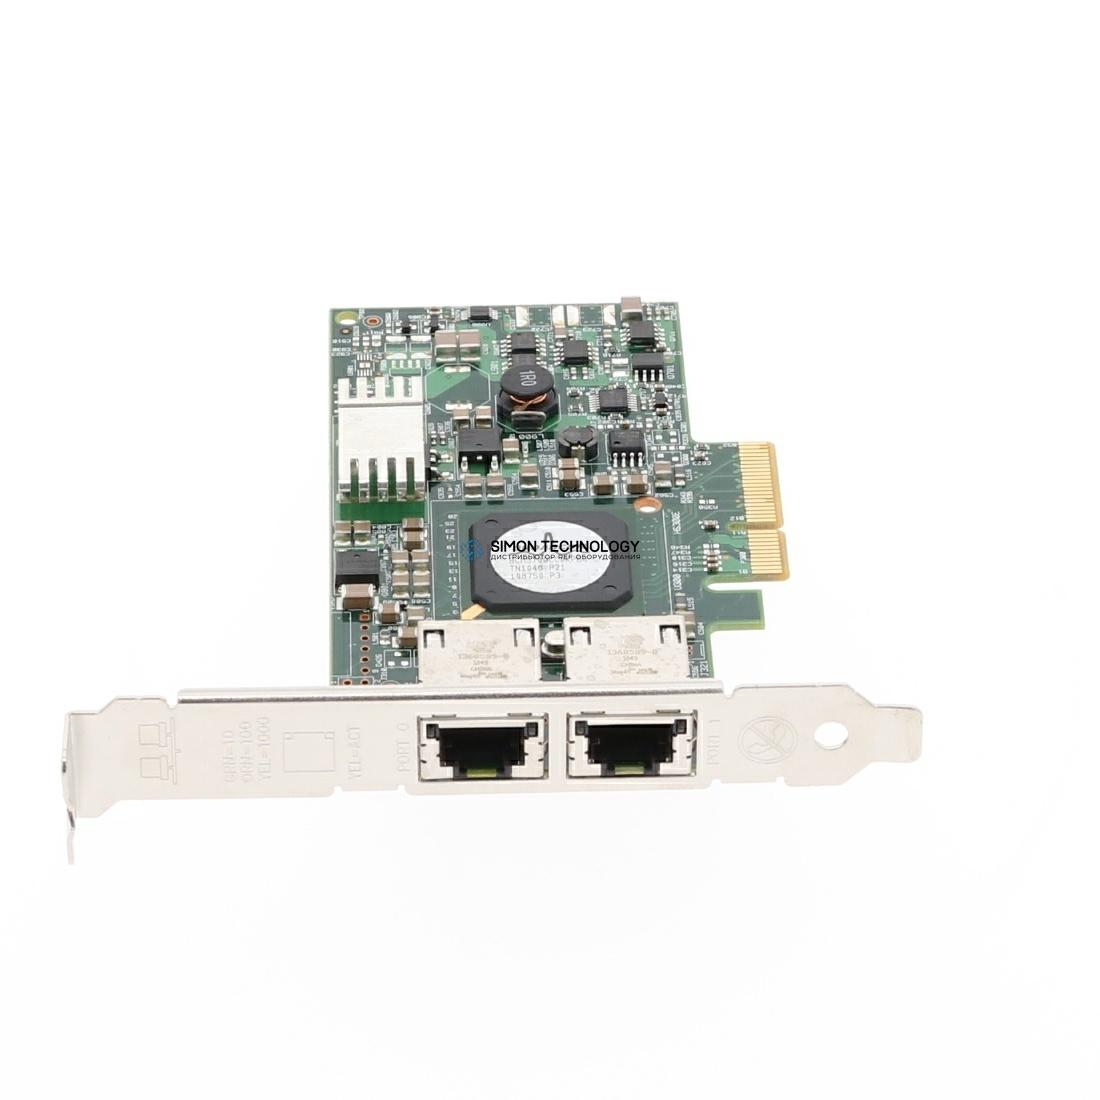 Сетевая карта IBM Express NetXtreme II 1000 Express Dual Port Ethern Ethernet Adapter (90Y4576)